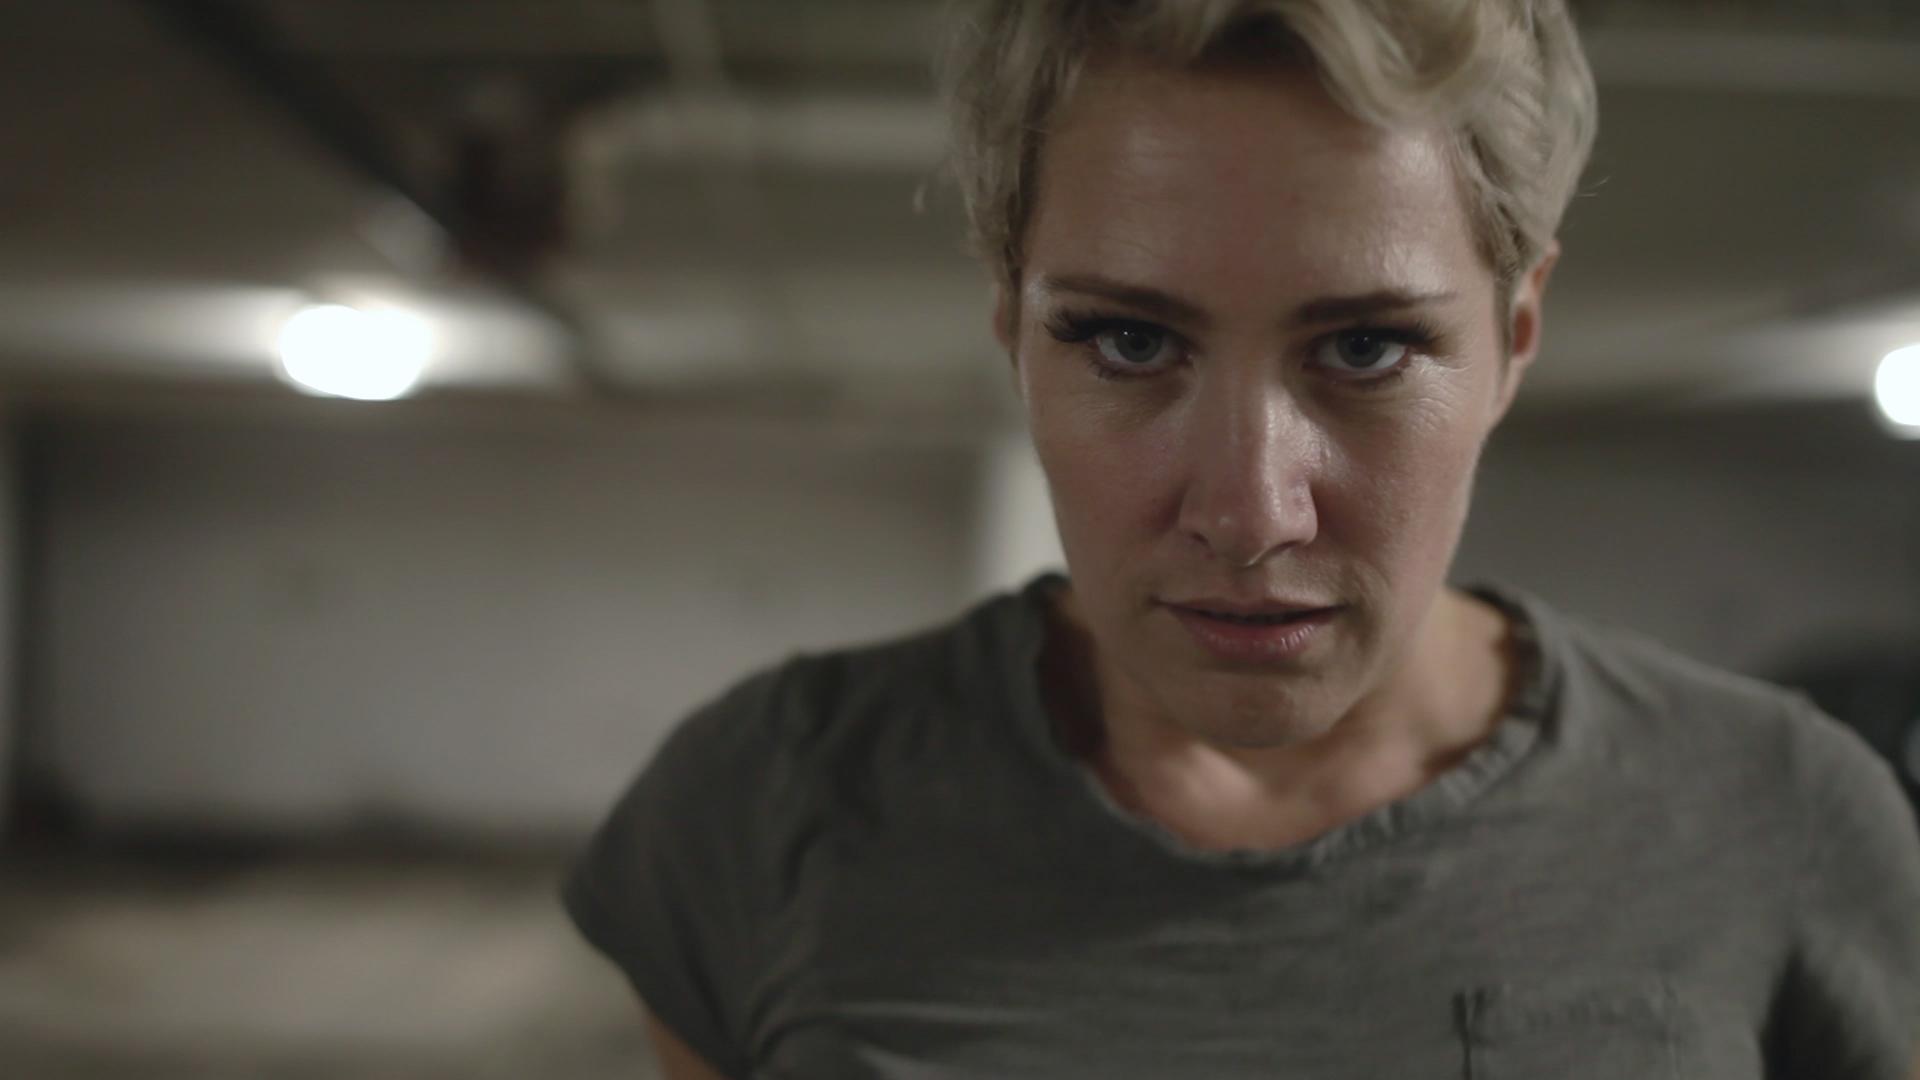 Vincent Valentino -Les Misérables  A woman fights for survival in a dystopian future.